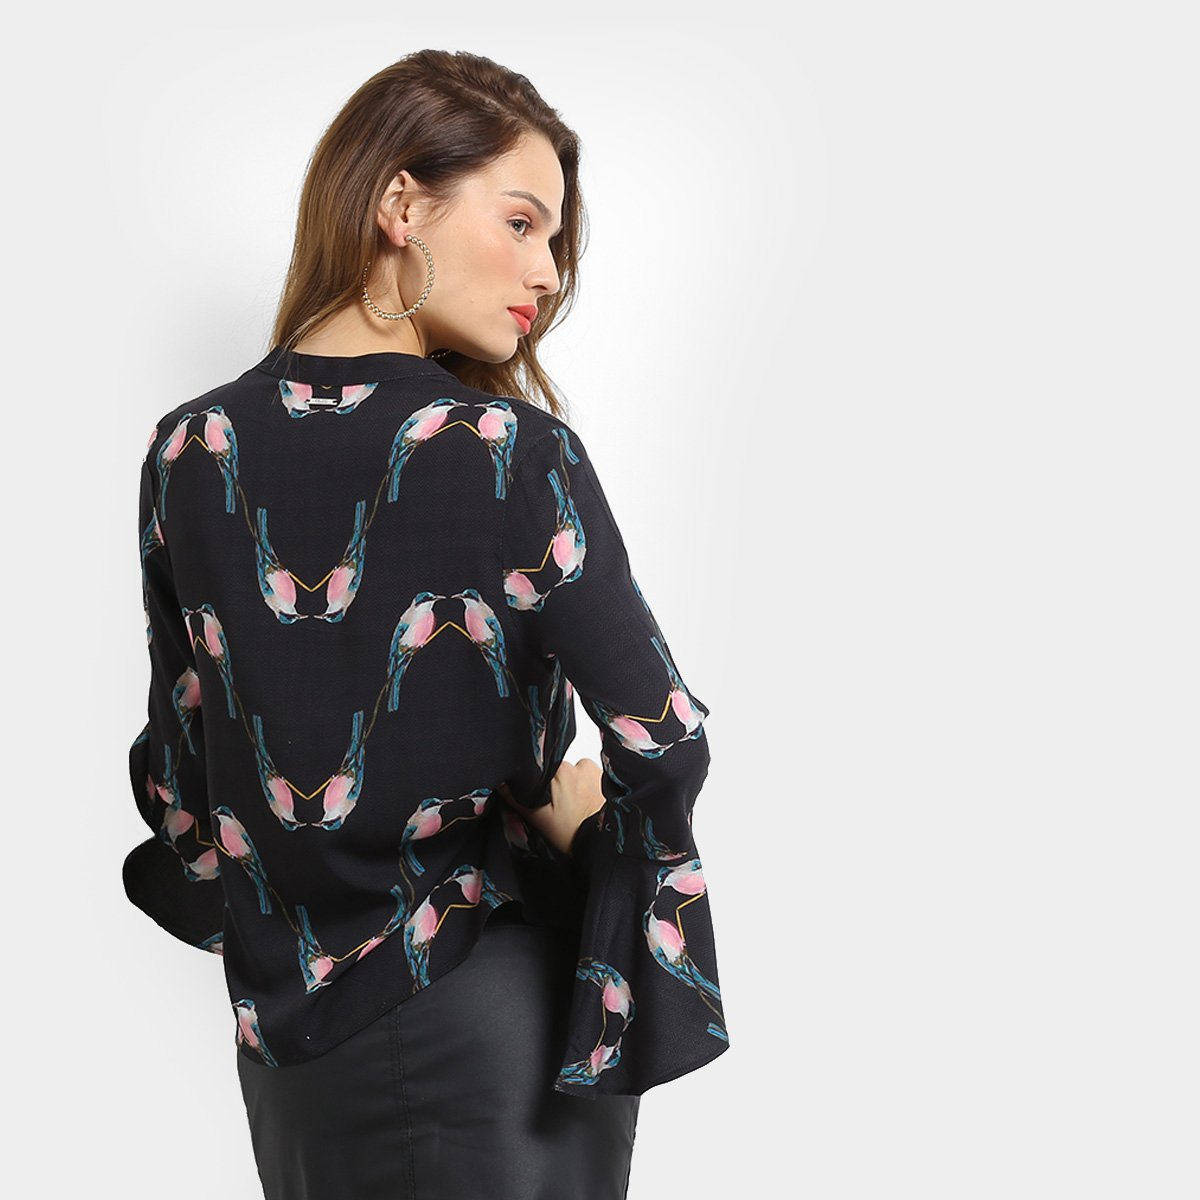 9cc2f8146 Camisa Colcci Pássaros Manga Sino Feminina - Compre Agora | Zattini